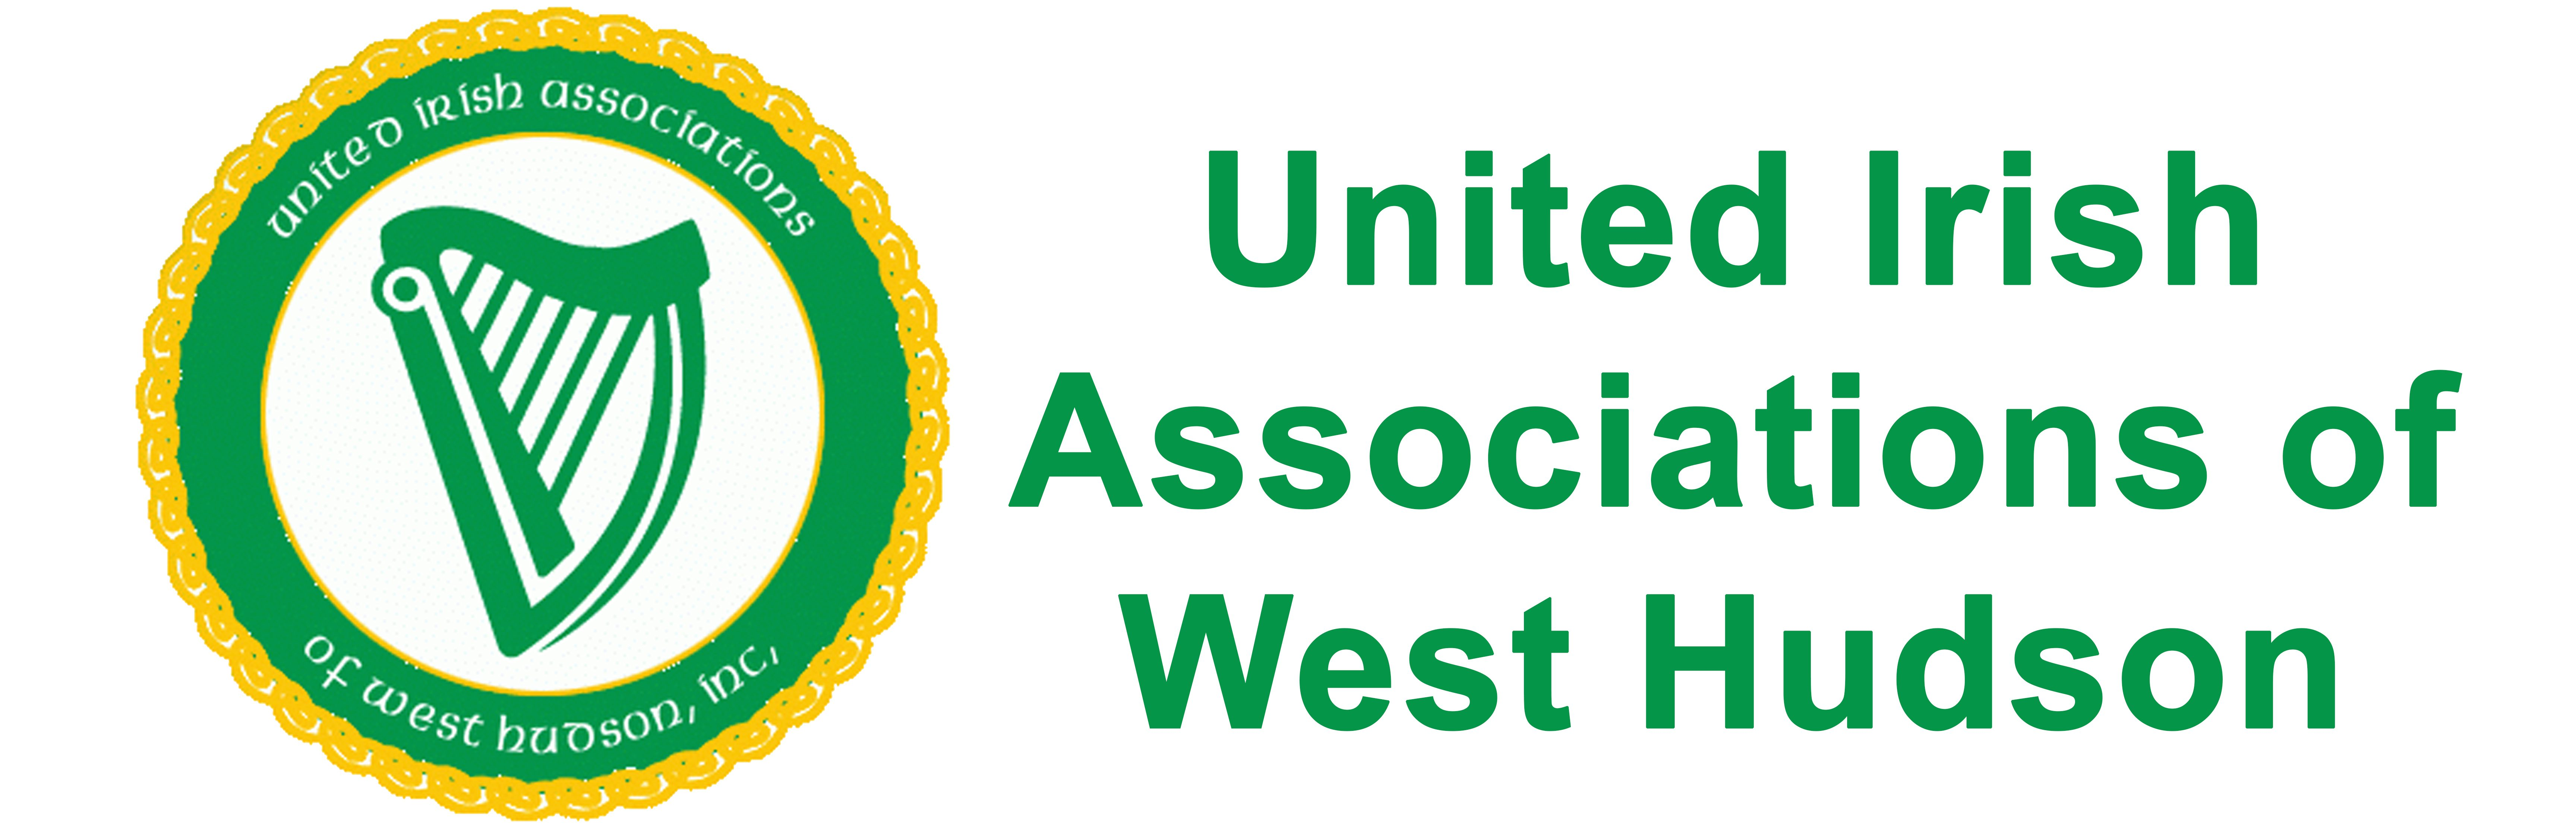 United Irish Associations of West Hudson